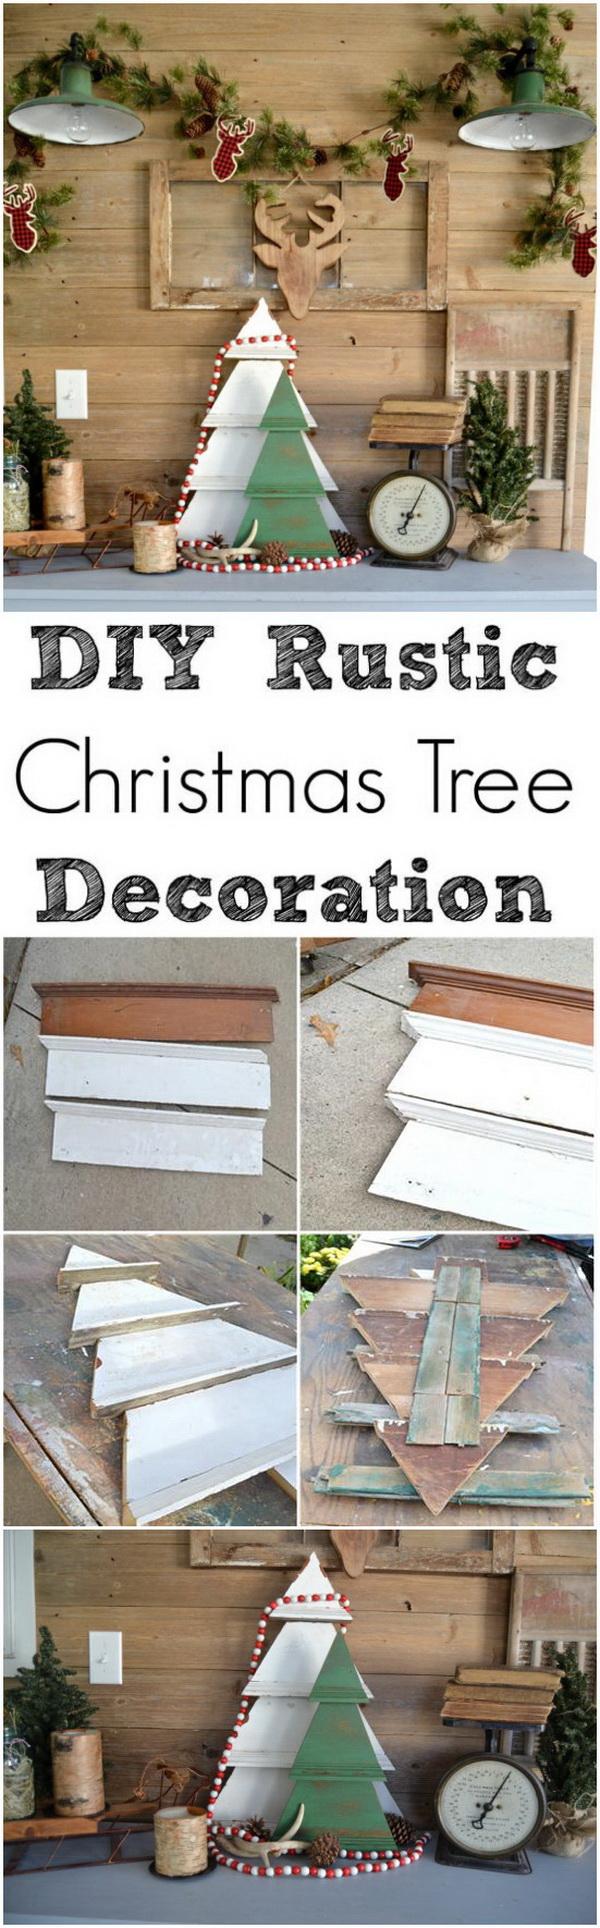 DIY Rustic Christmas Tree Decoration.